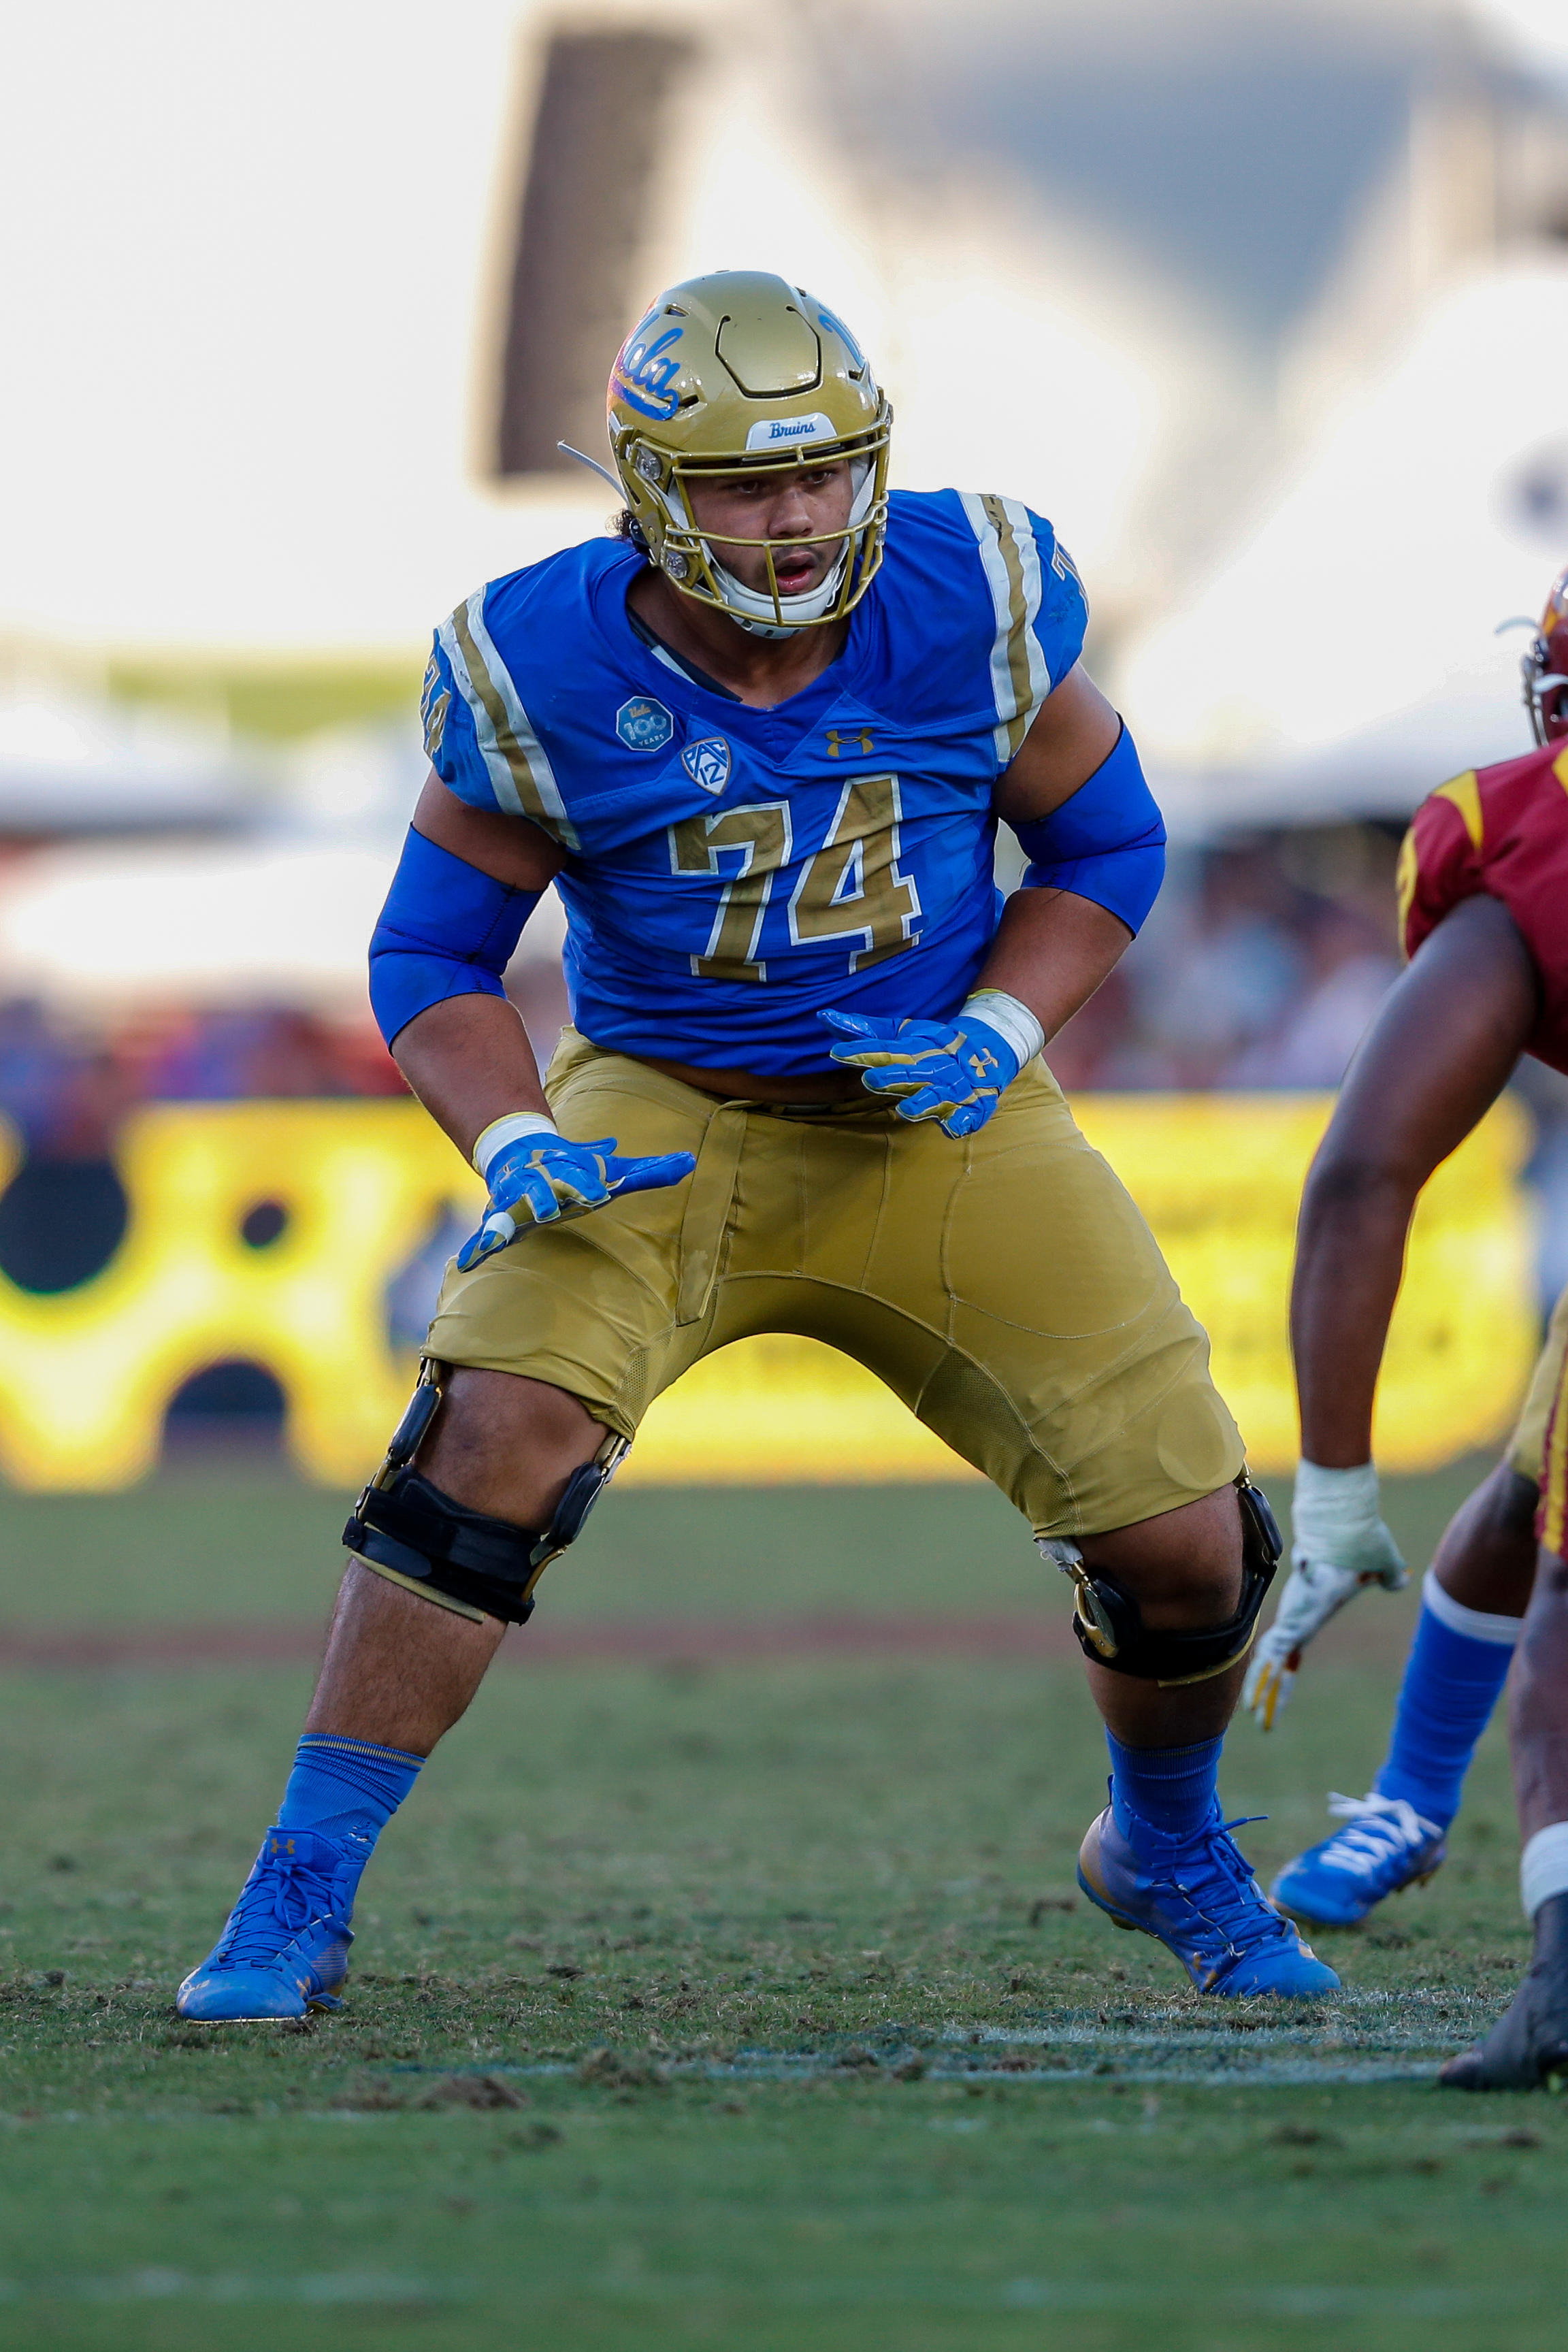 COLLEGE FOOTBALL: NOV 23 UCLA at USC